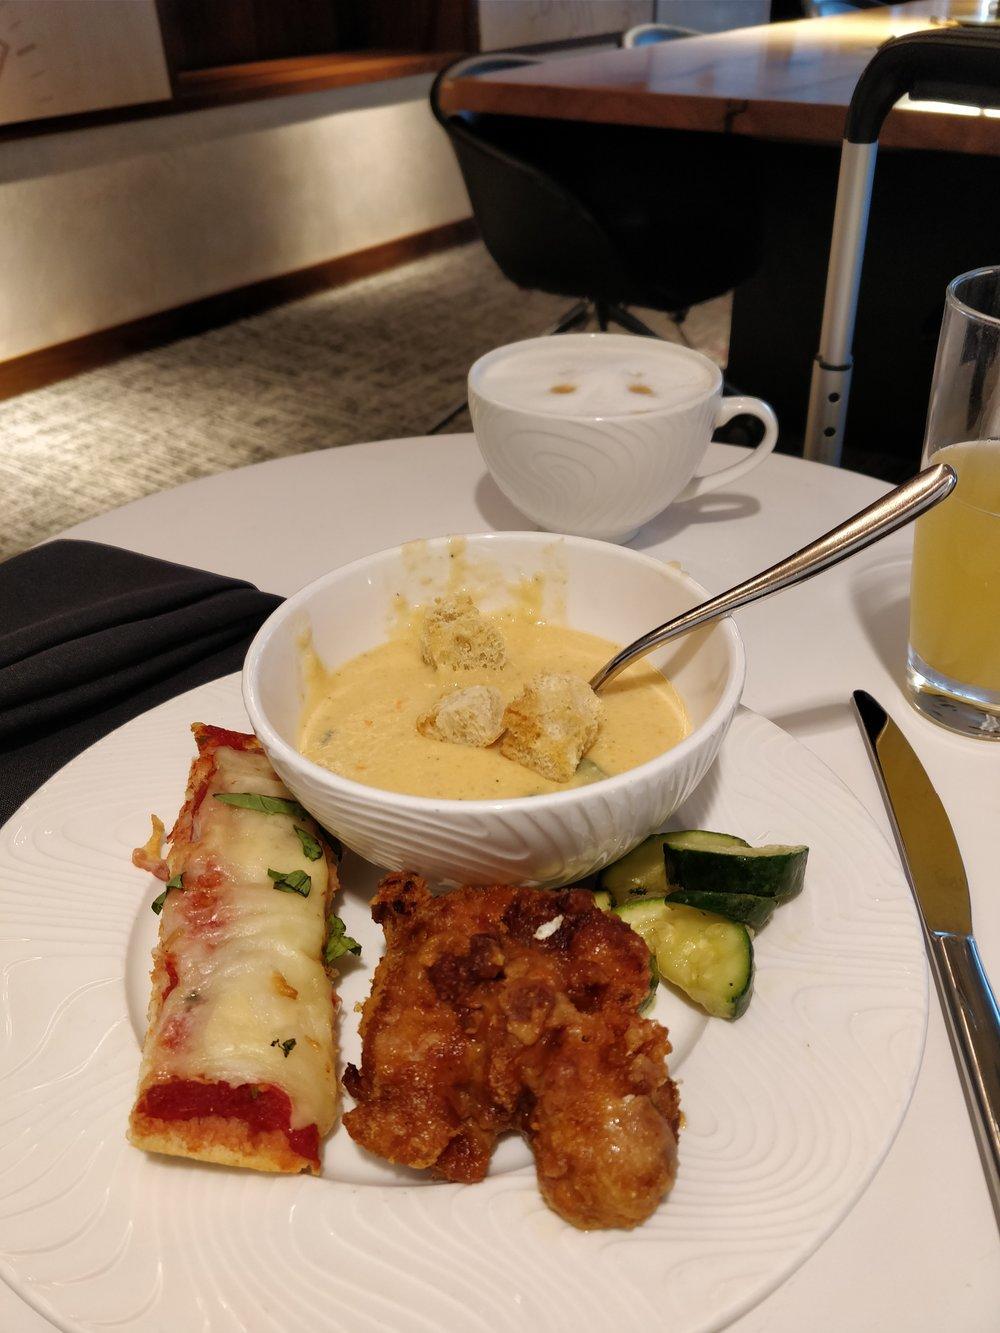 bruschetta, fried chicken, and potato soup